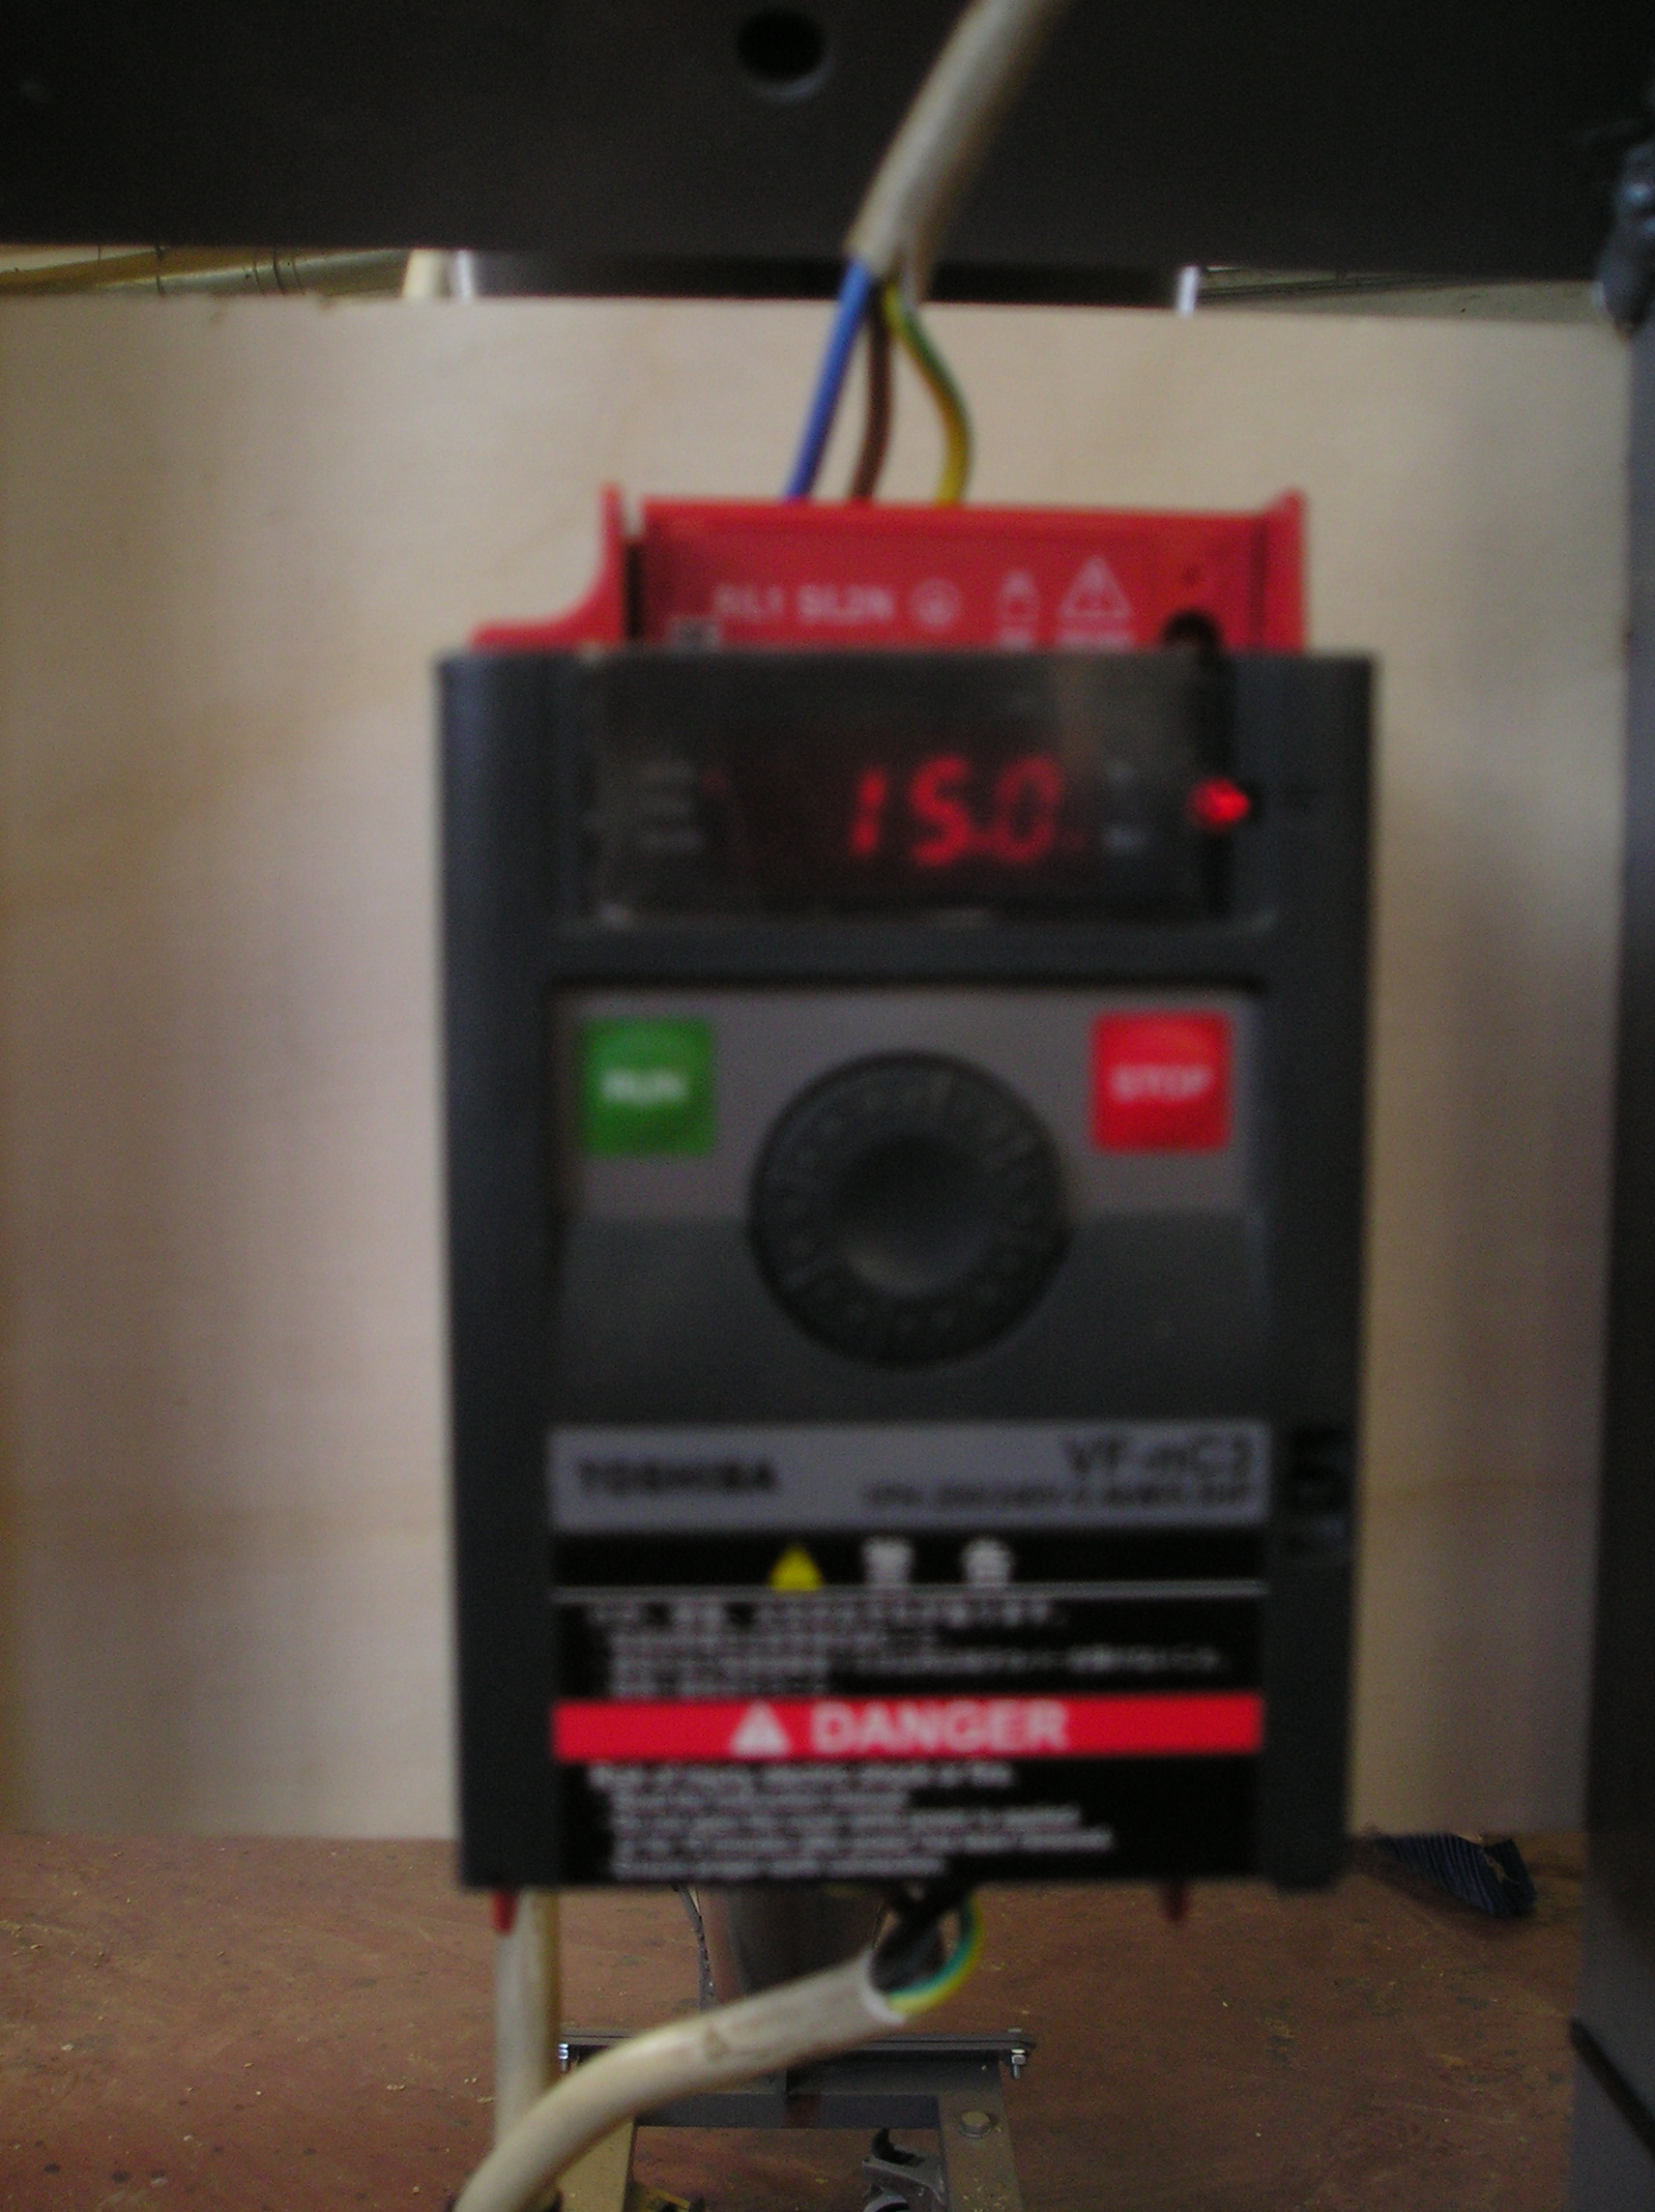 http://www.energialternativa.info/public/newforum/ForumEA/G/regolatore_1.JPG